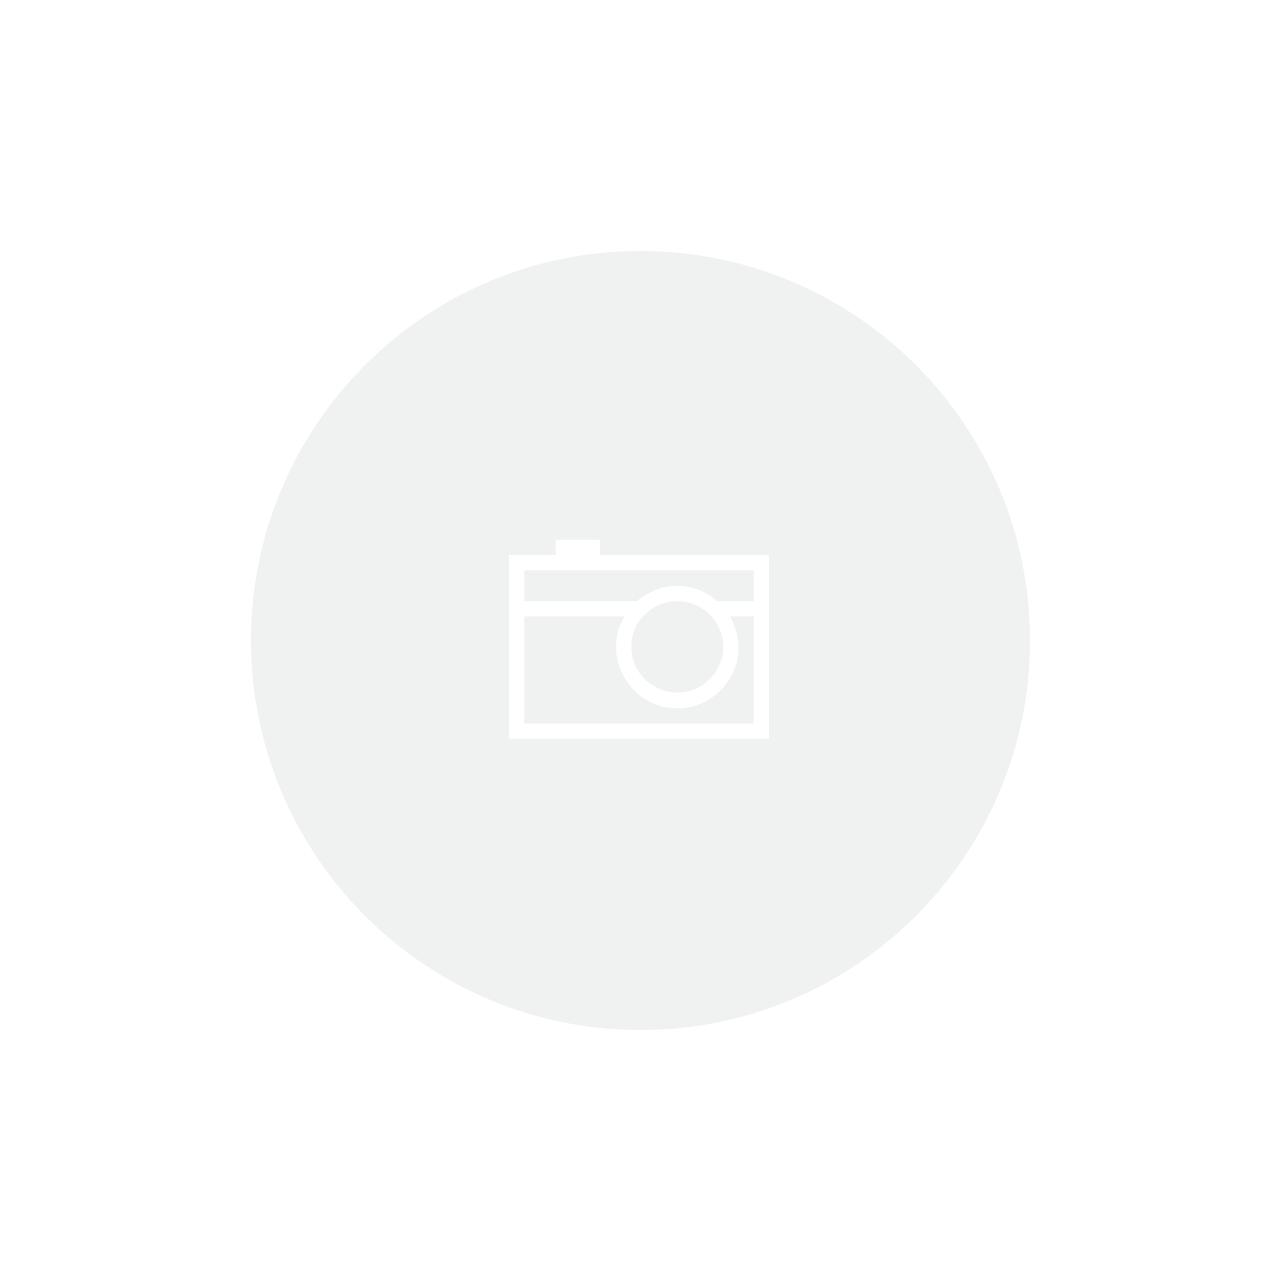 Kit Espumante Tevere Meio Doce - 6 unidades